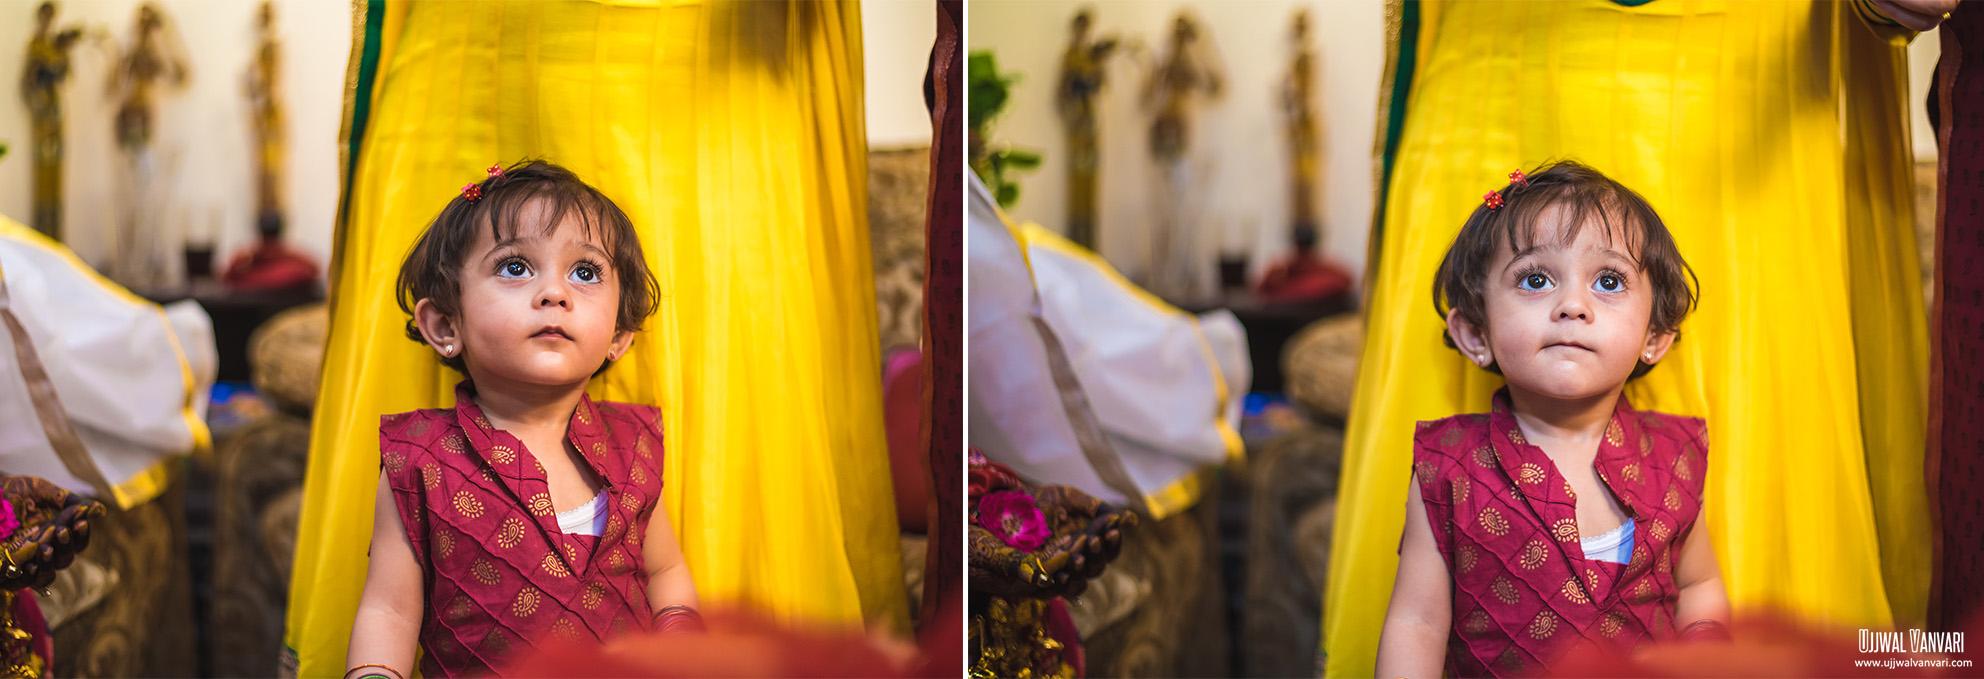 Lucknow wedding photography | MANNAT & RISHABH LUCKNOW wedding | candid wedding photography